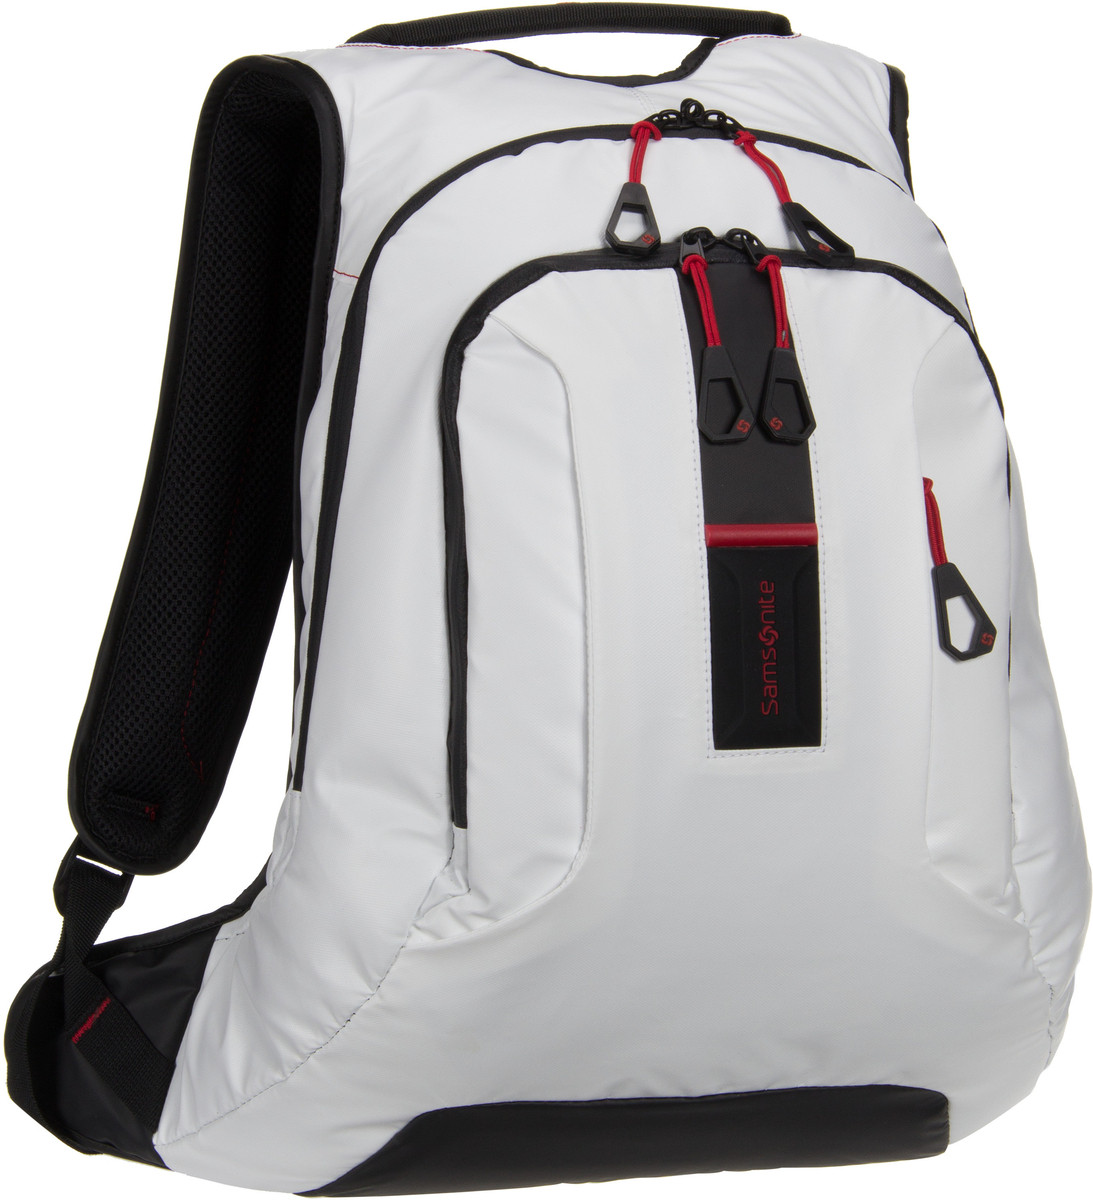 Samsonite Paradiver Light Laptop Backpack L Whi...